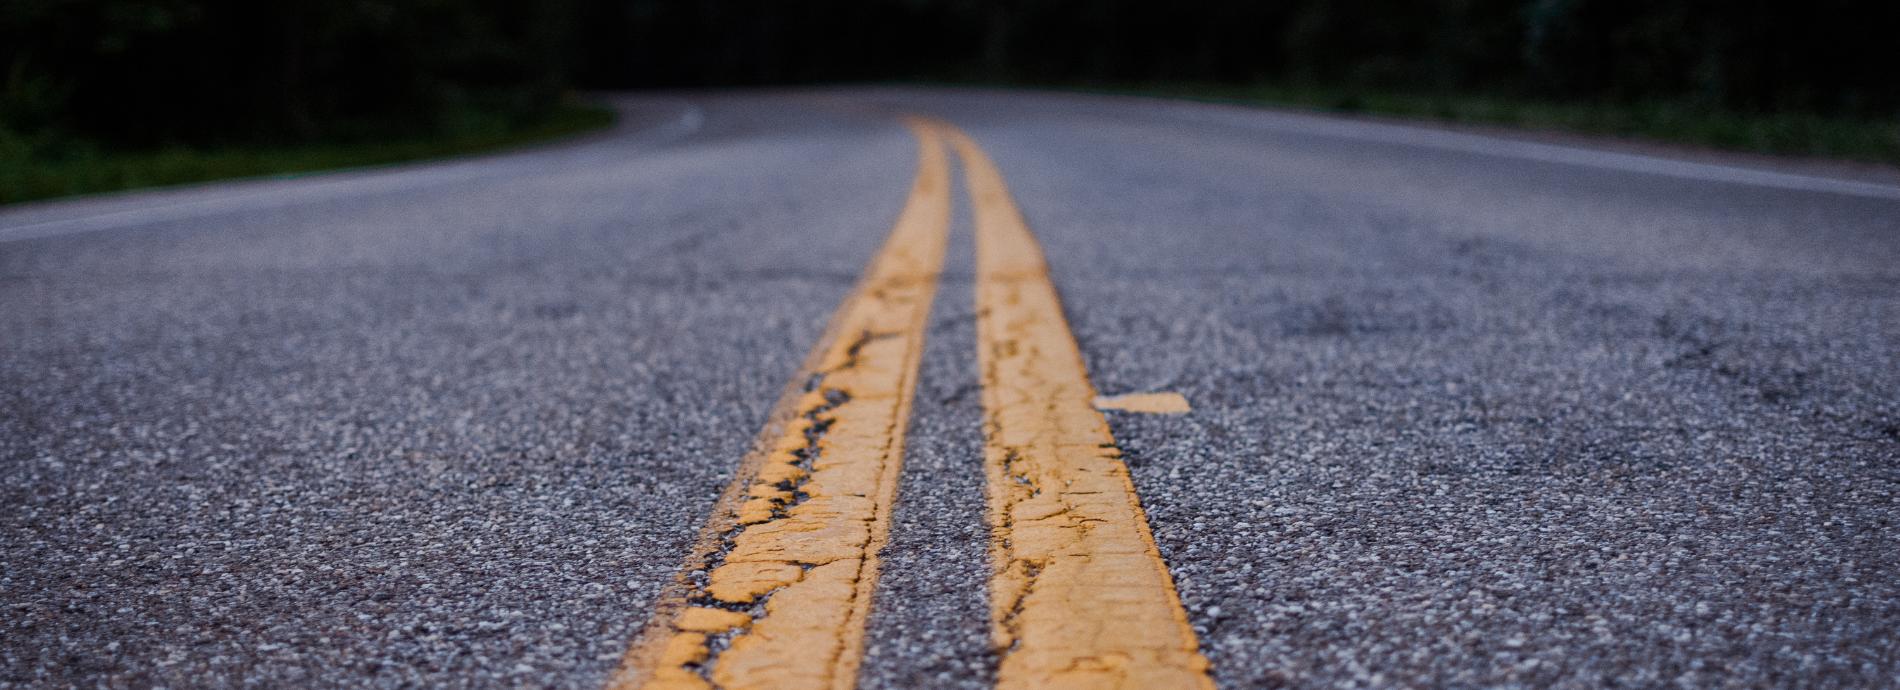 Photo of Road